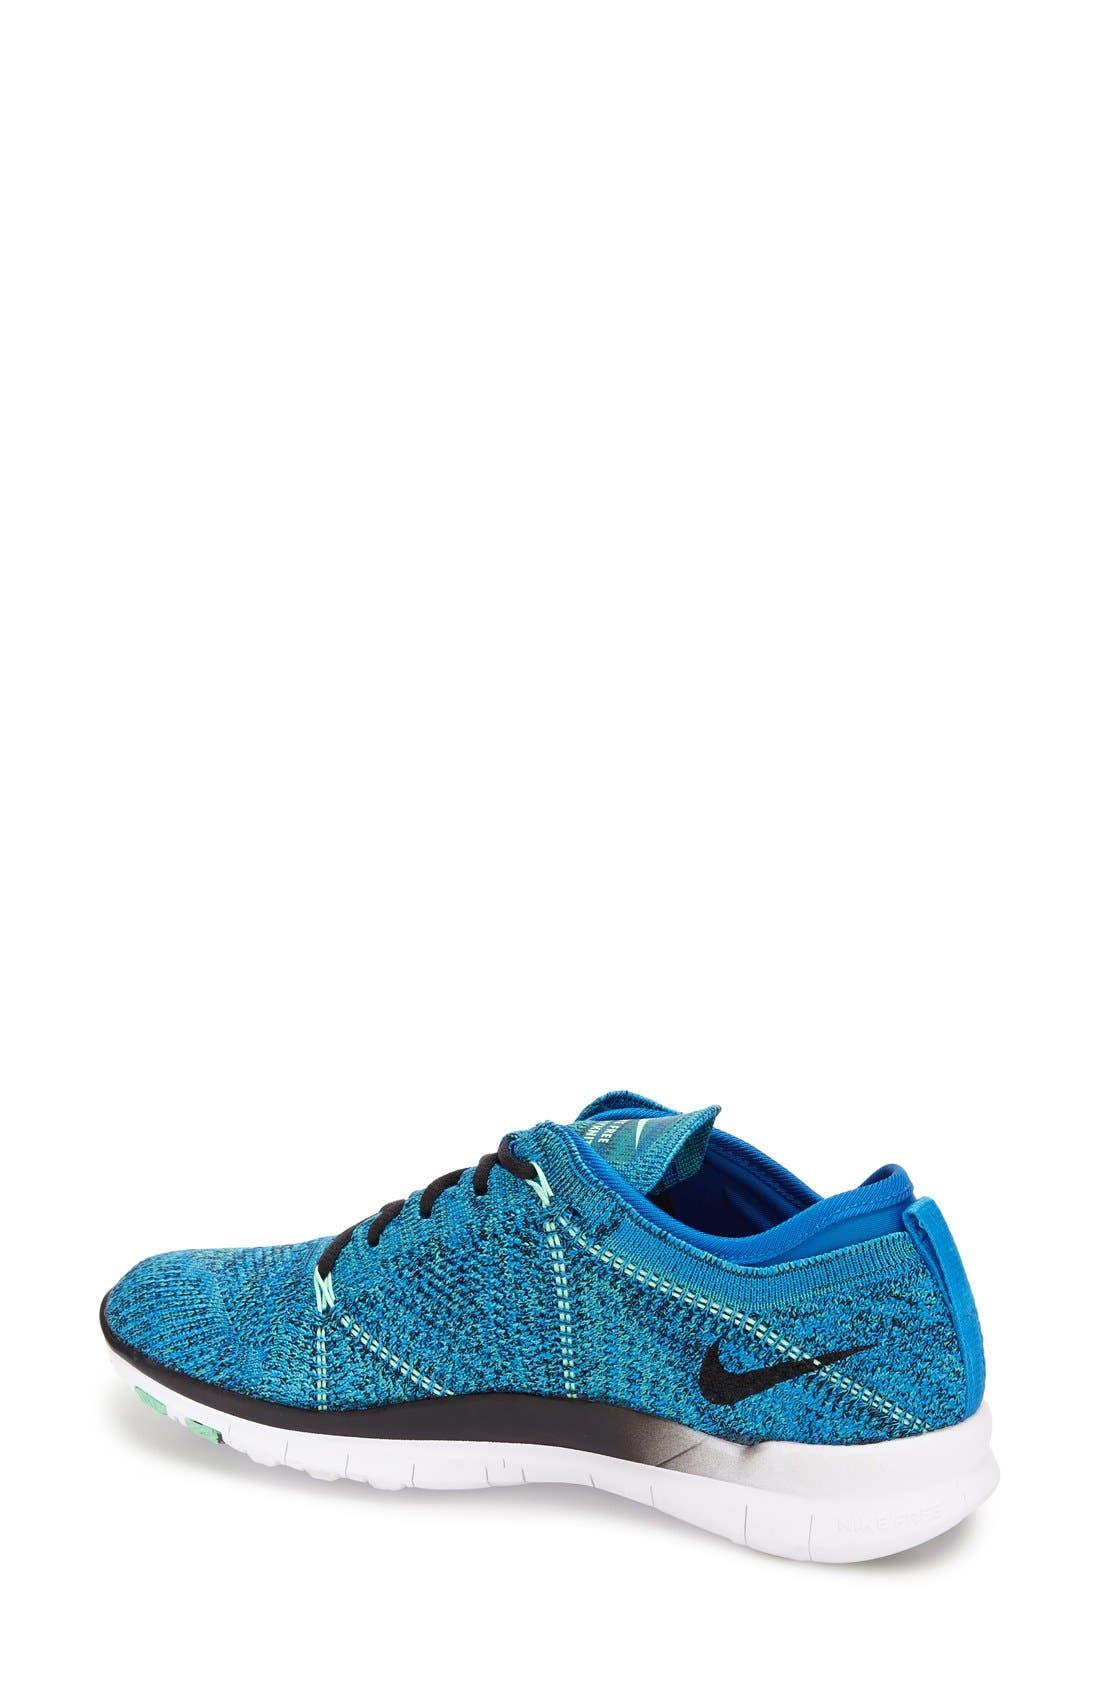 ,                             'Free Flyknit 5.0 TR' Training Shoe,                             Alternate thumbnail 31, color,                             401